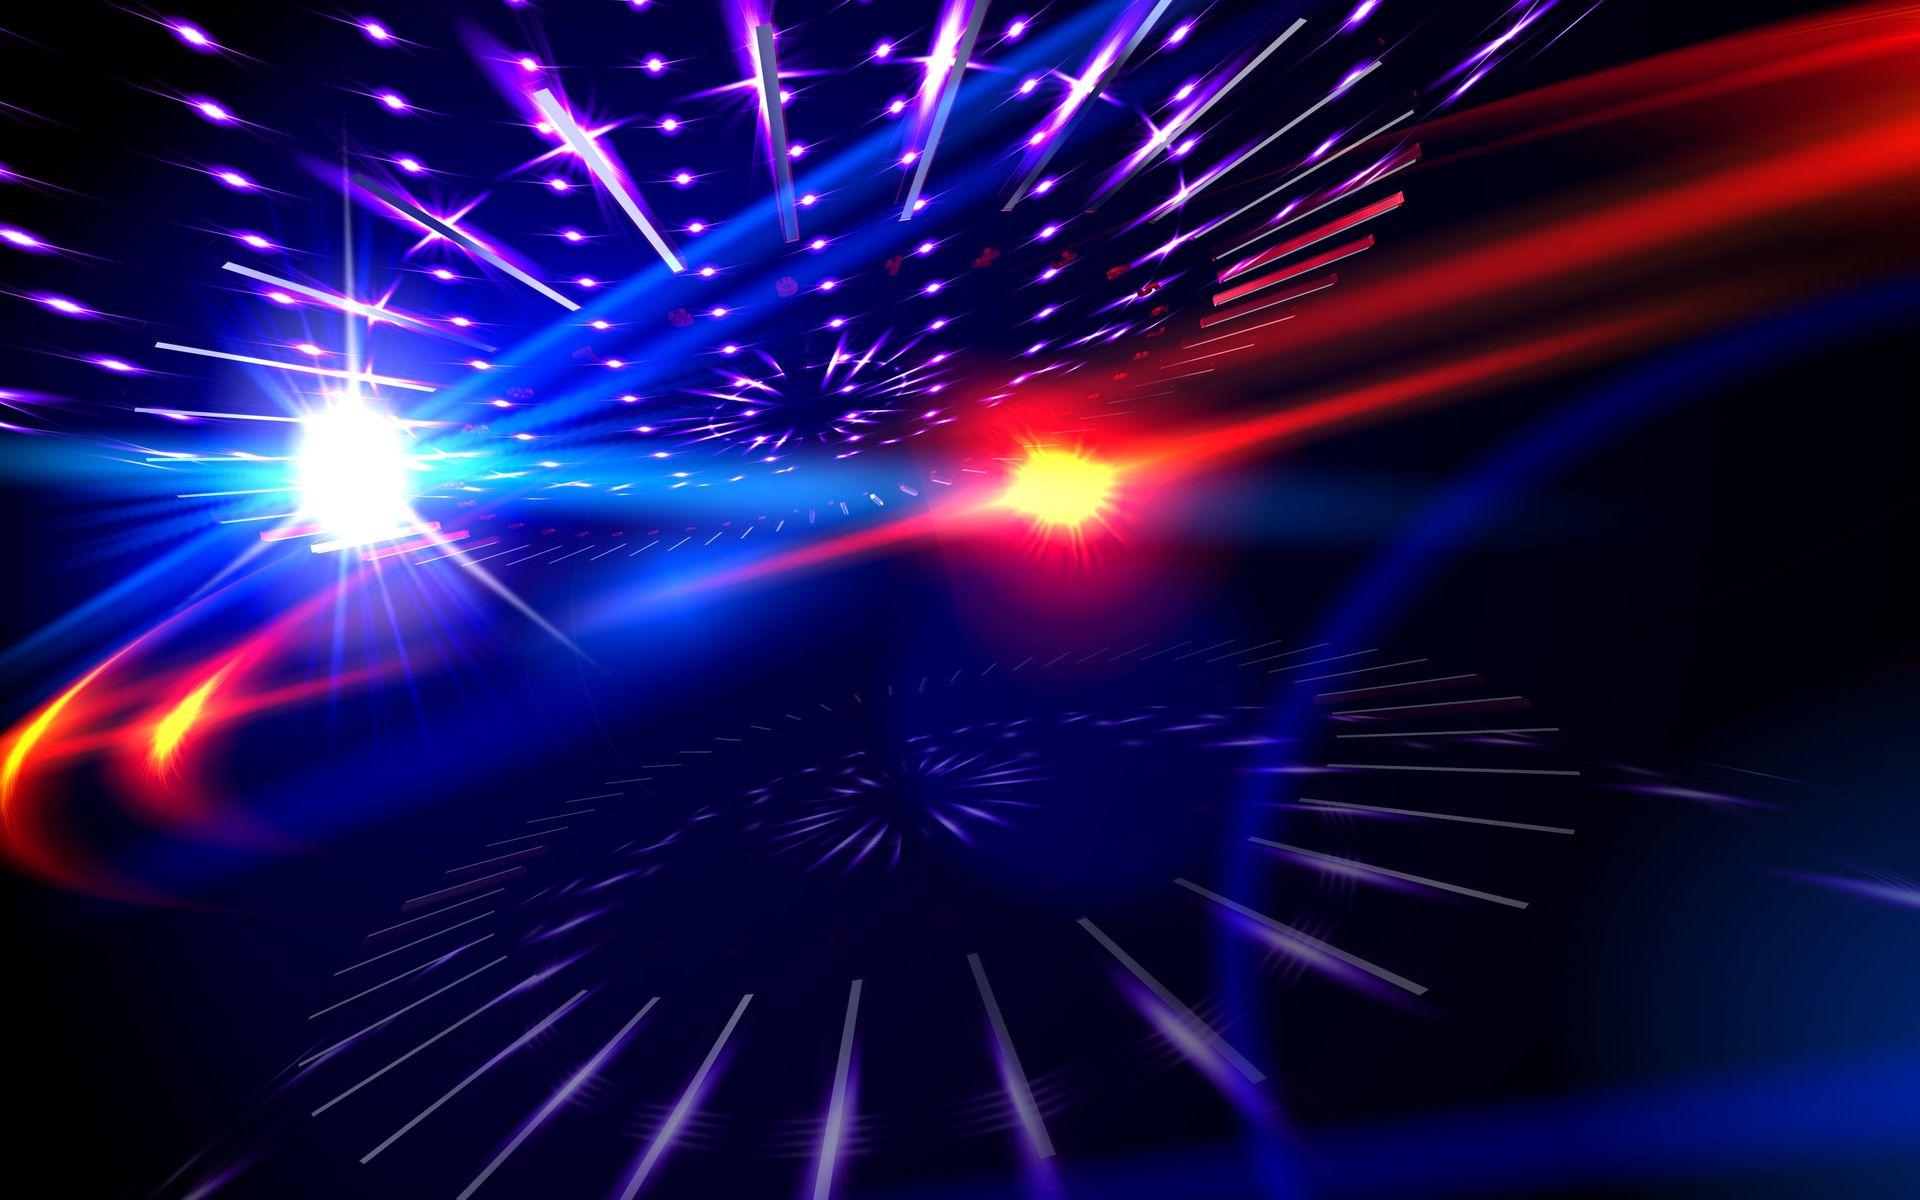 Download Dj Mixer Work 2048 X 2048 Wallpapers: DJ Lights Wallpaper Download HD 13931